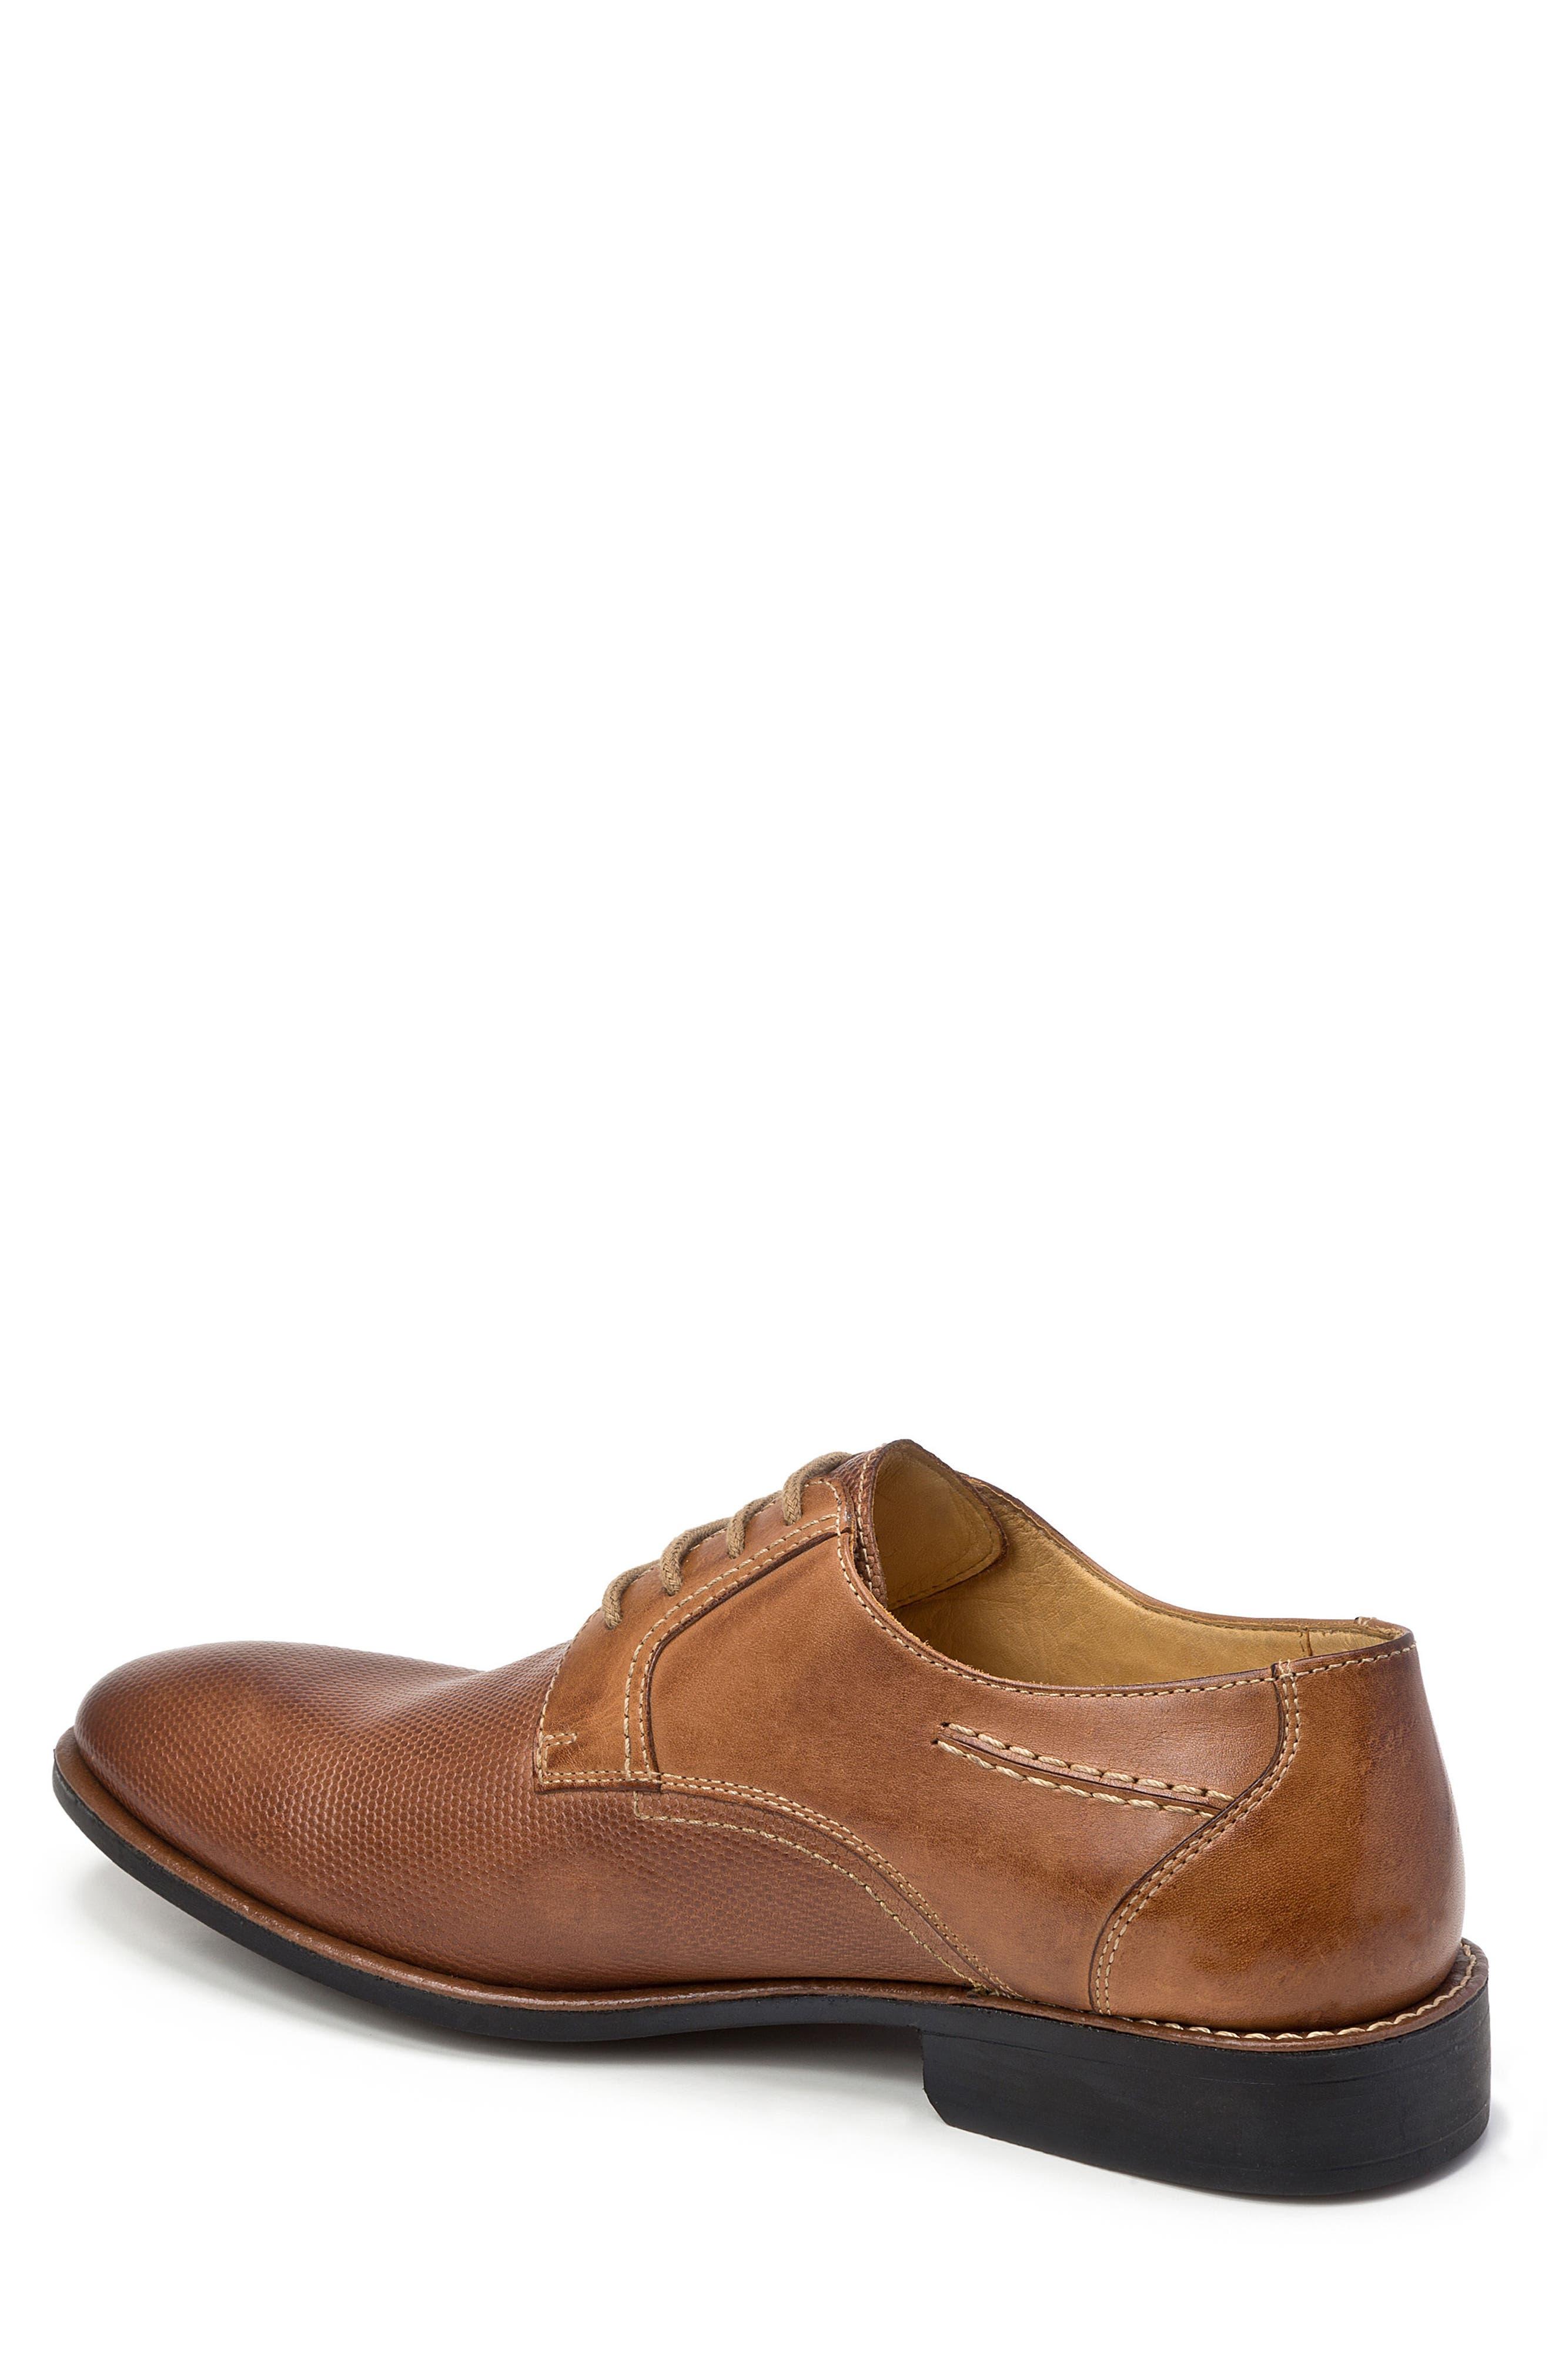 Trenso Plain Toe Derby,                             Alternate thumbnail 2, color,                             Tan Leather